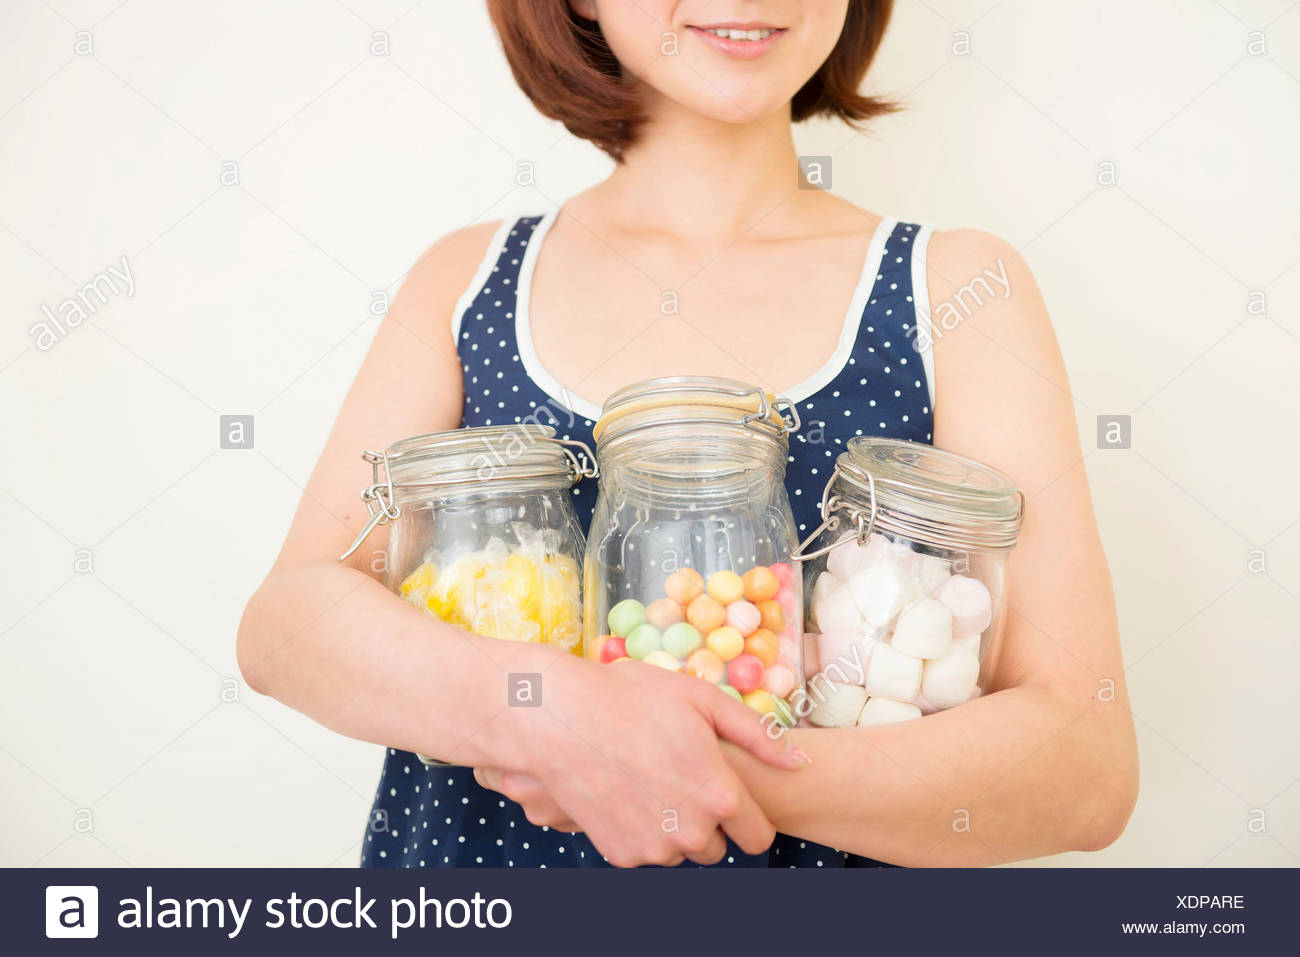 Woman hugging three jars of marshmallows, bubble gum and sherbet lemons - Stock Image